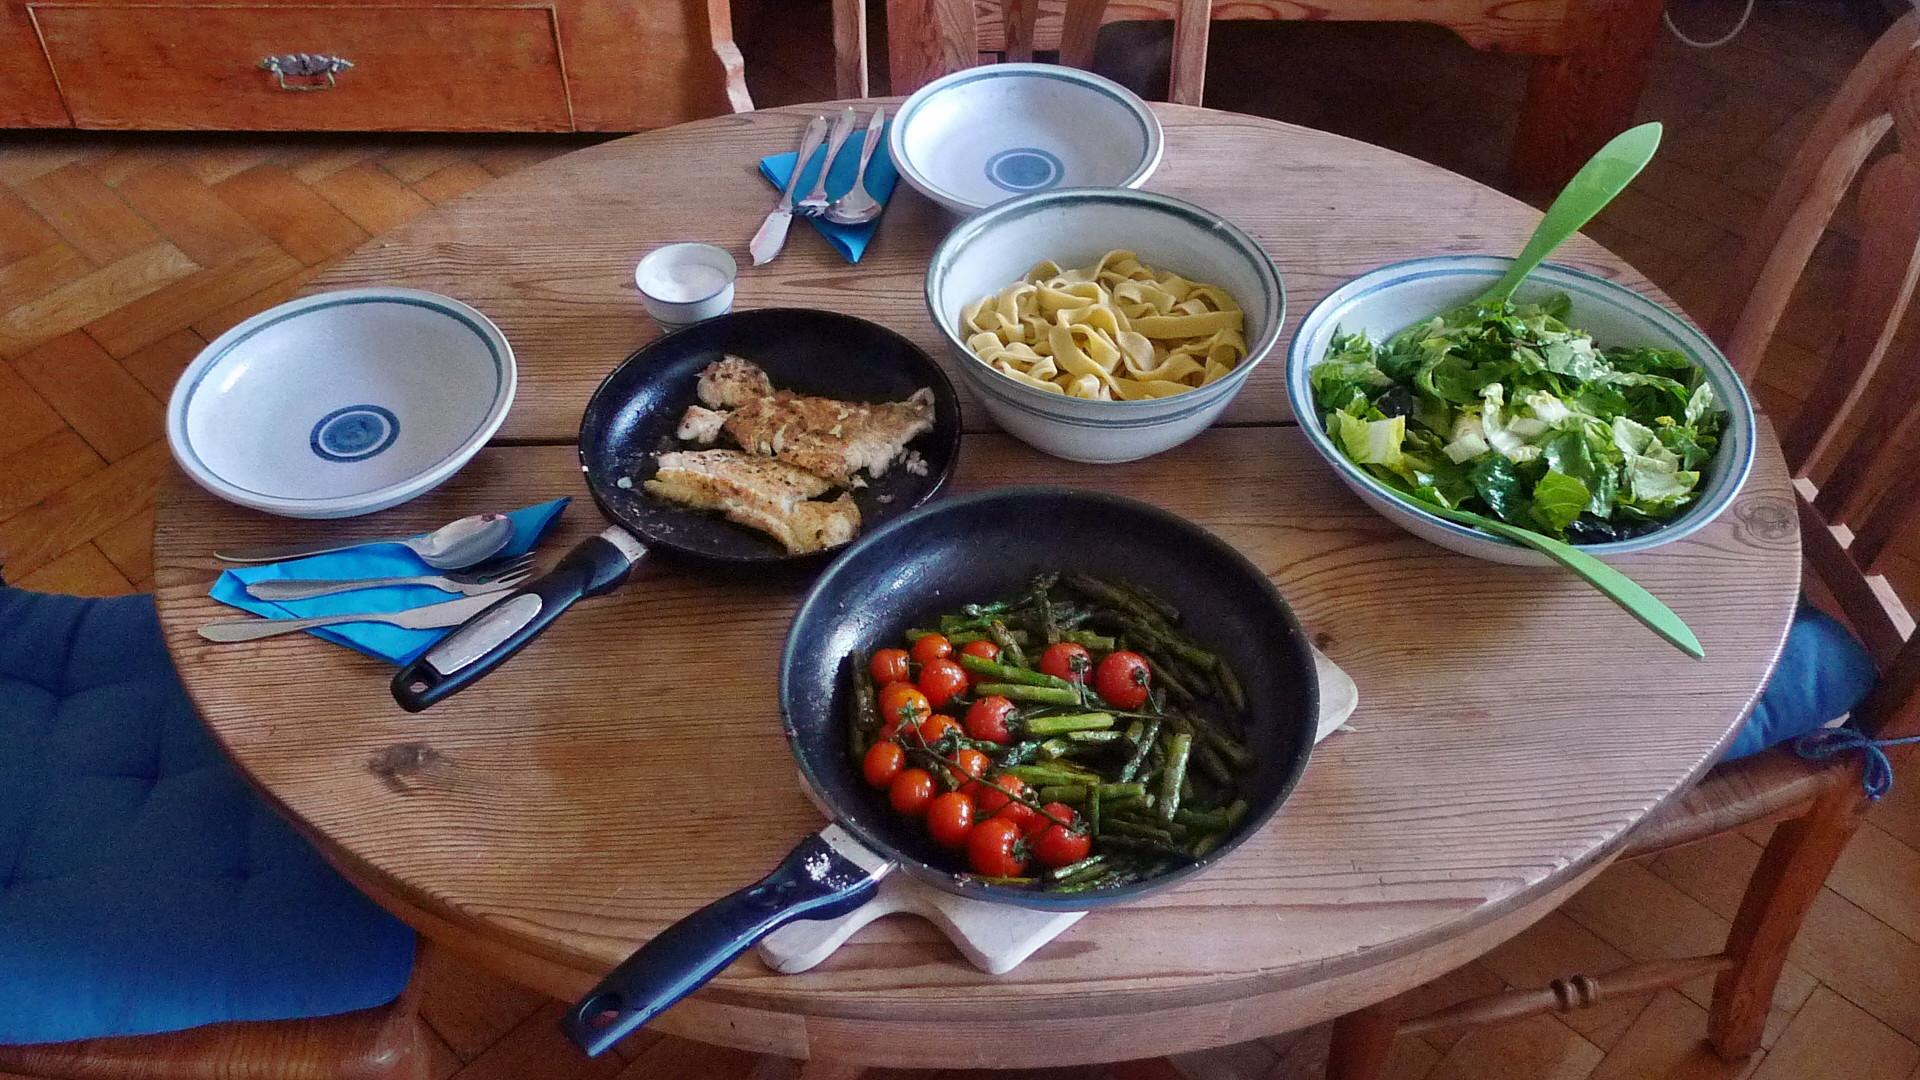 Kabeljau,Spargel,Nudeln,Salat, 16.4.15   (21)